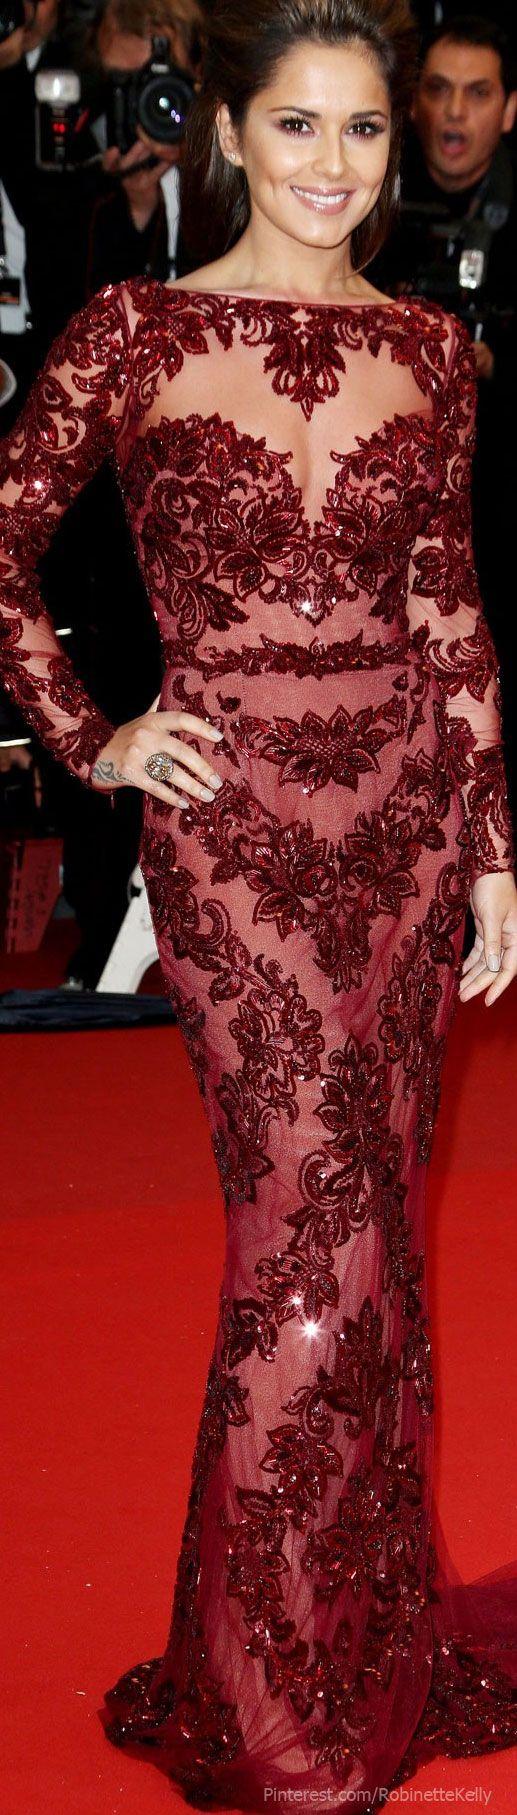 Rosamaria G Frangini | Burgundy Desire |  VIPBlackOrchidClub | Cheryl Cole, Zuhair Murad Burgundy* Dress | Cannes Film Festival LBV